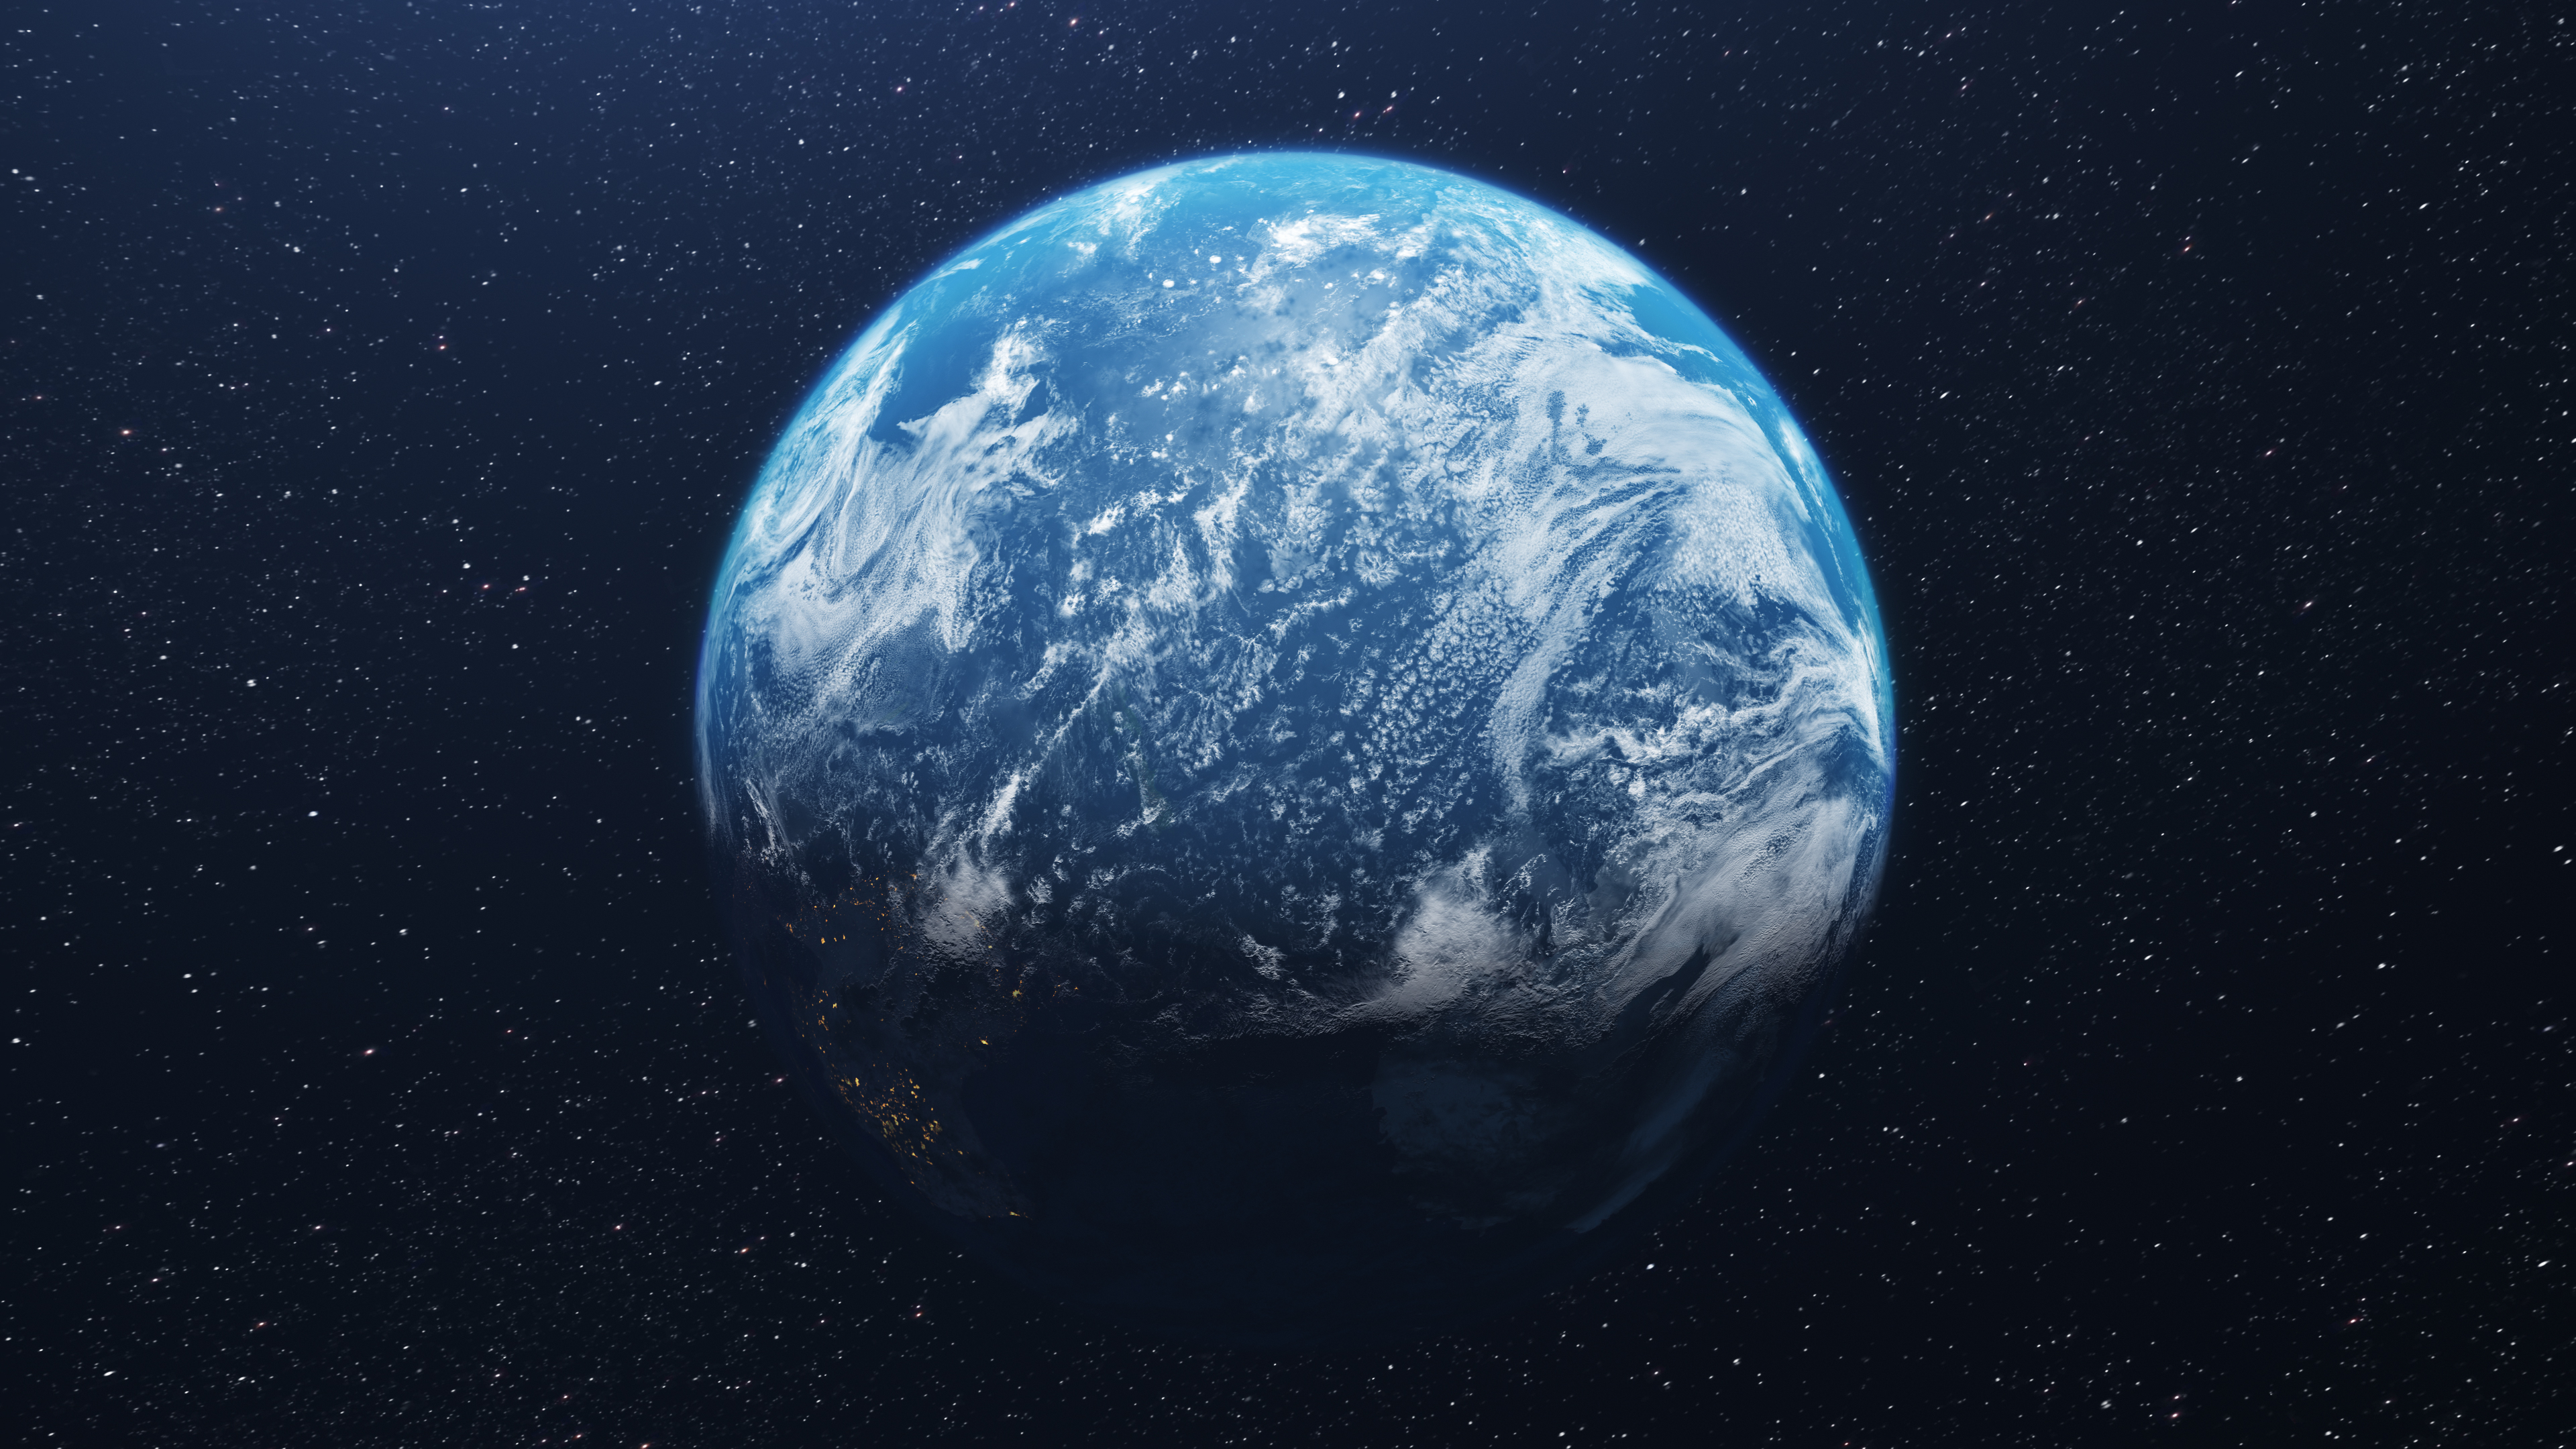 planeta cercano